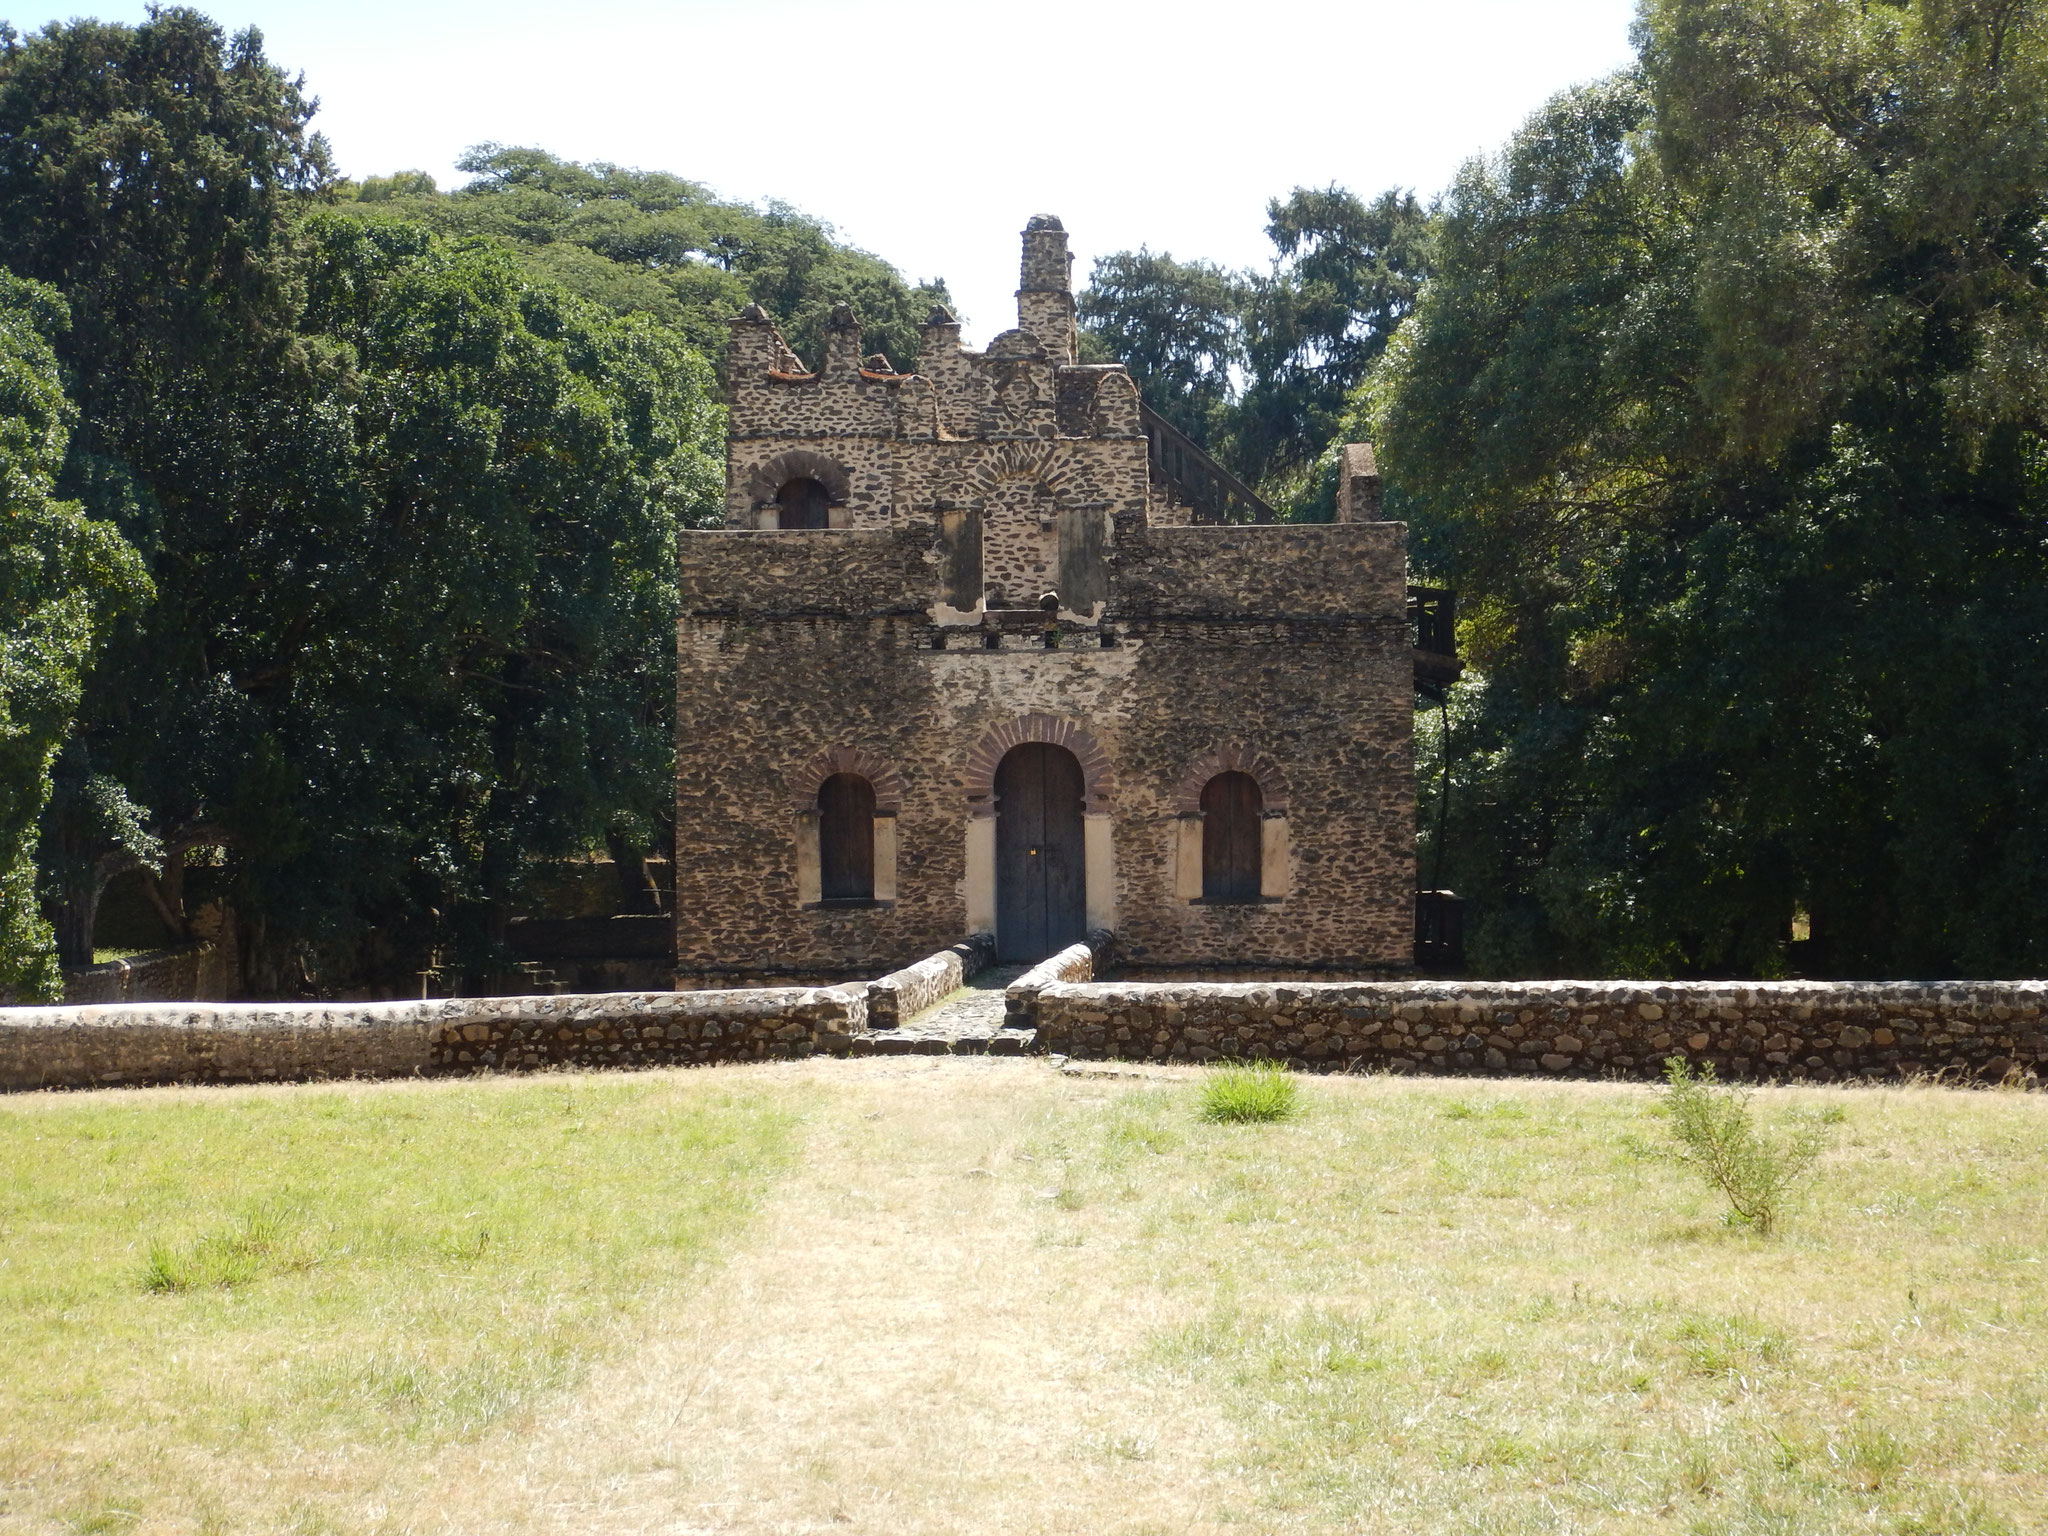 Voyage Séjour Road Trip Trek Trekking Randonnée en Ethiopie. Visite de Gondar en Ethiopie. La piscine de Fasilidas